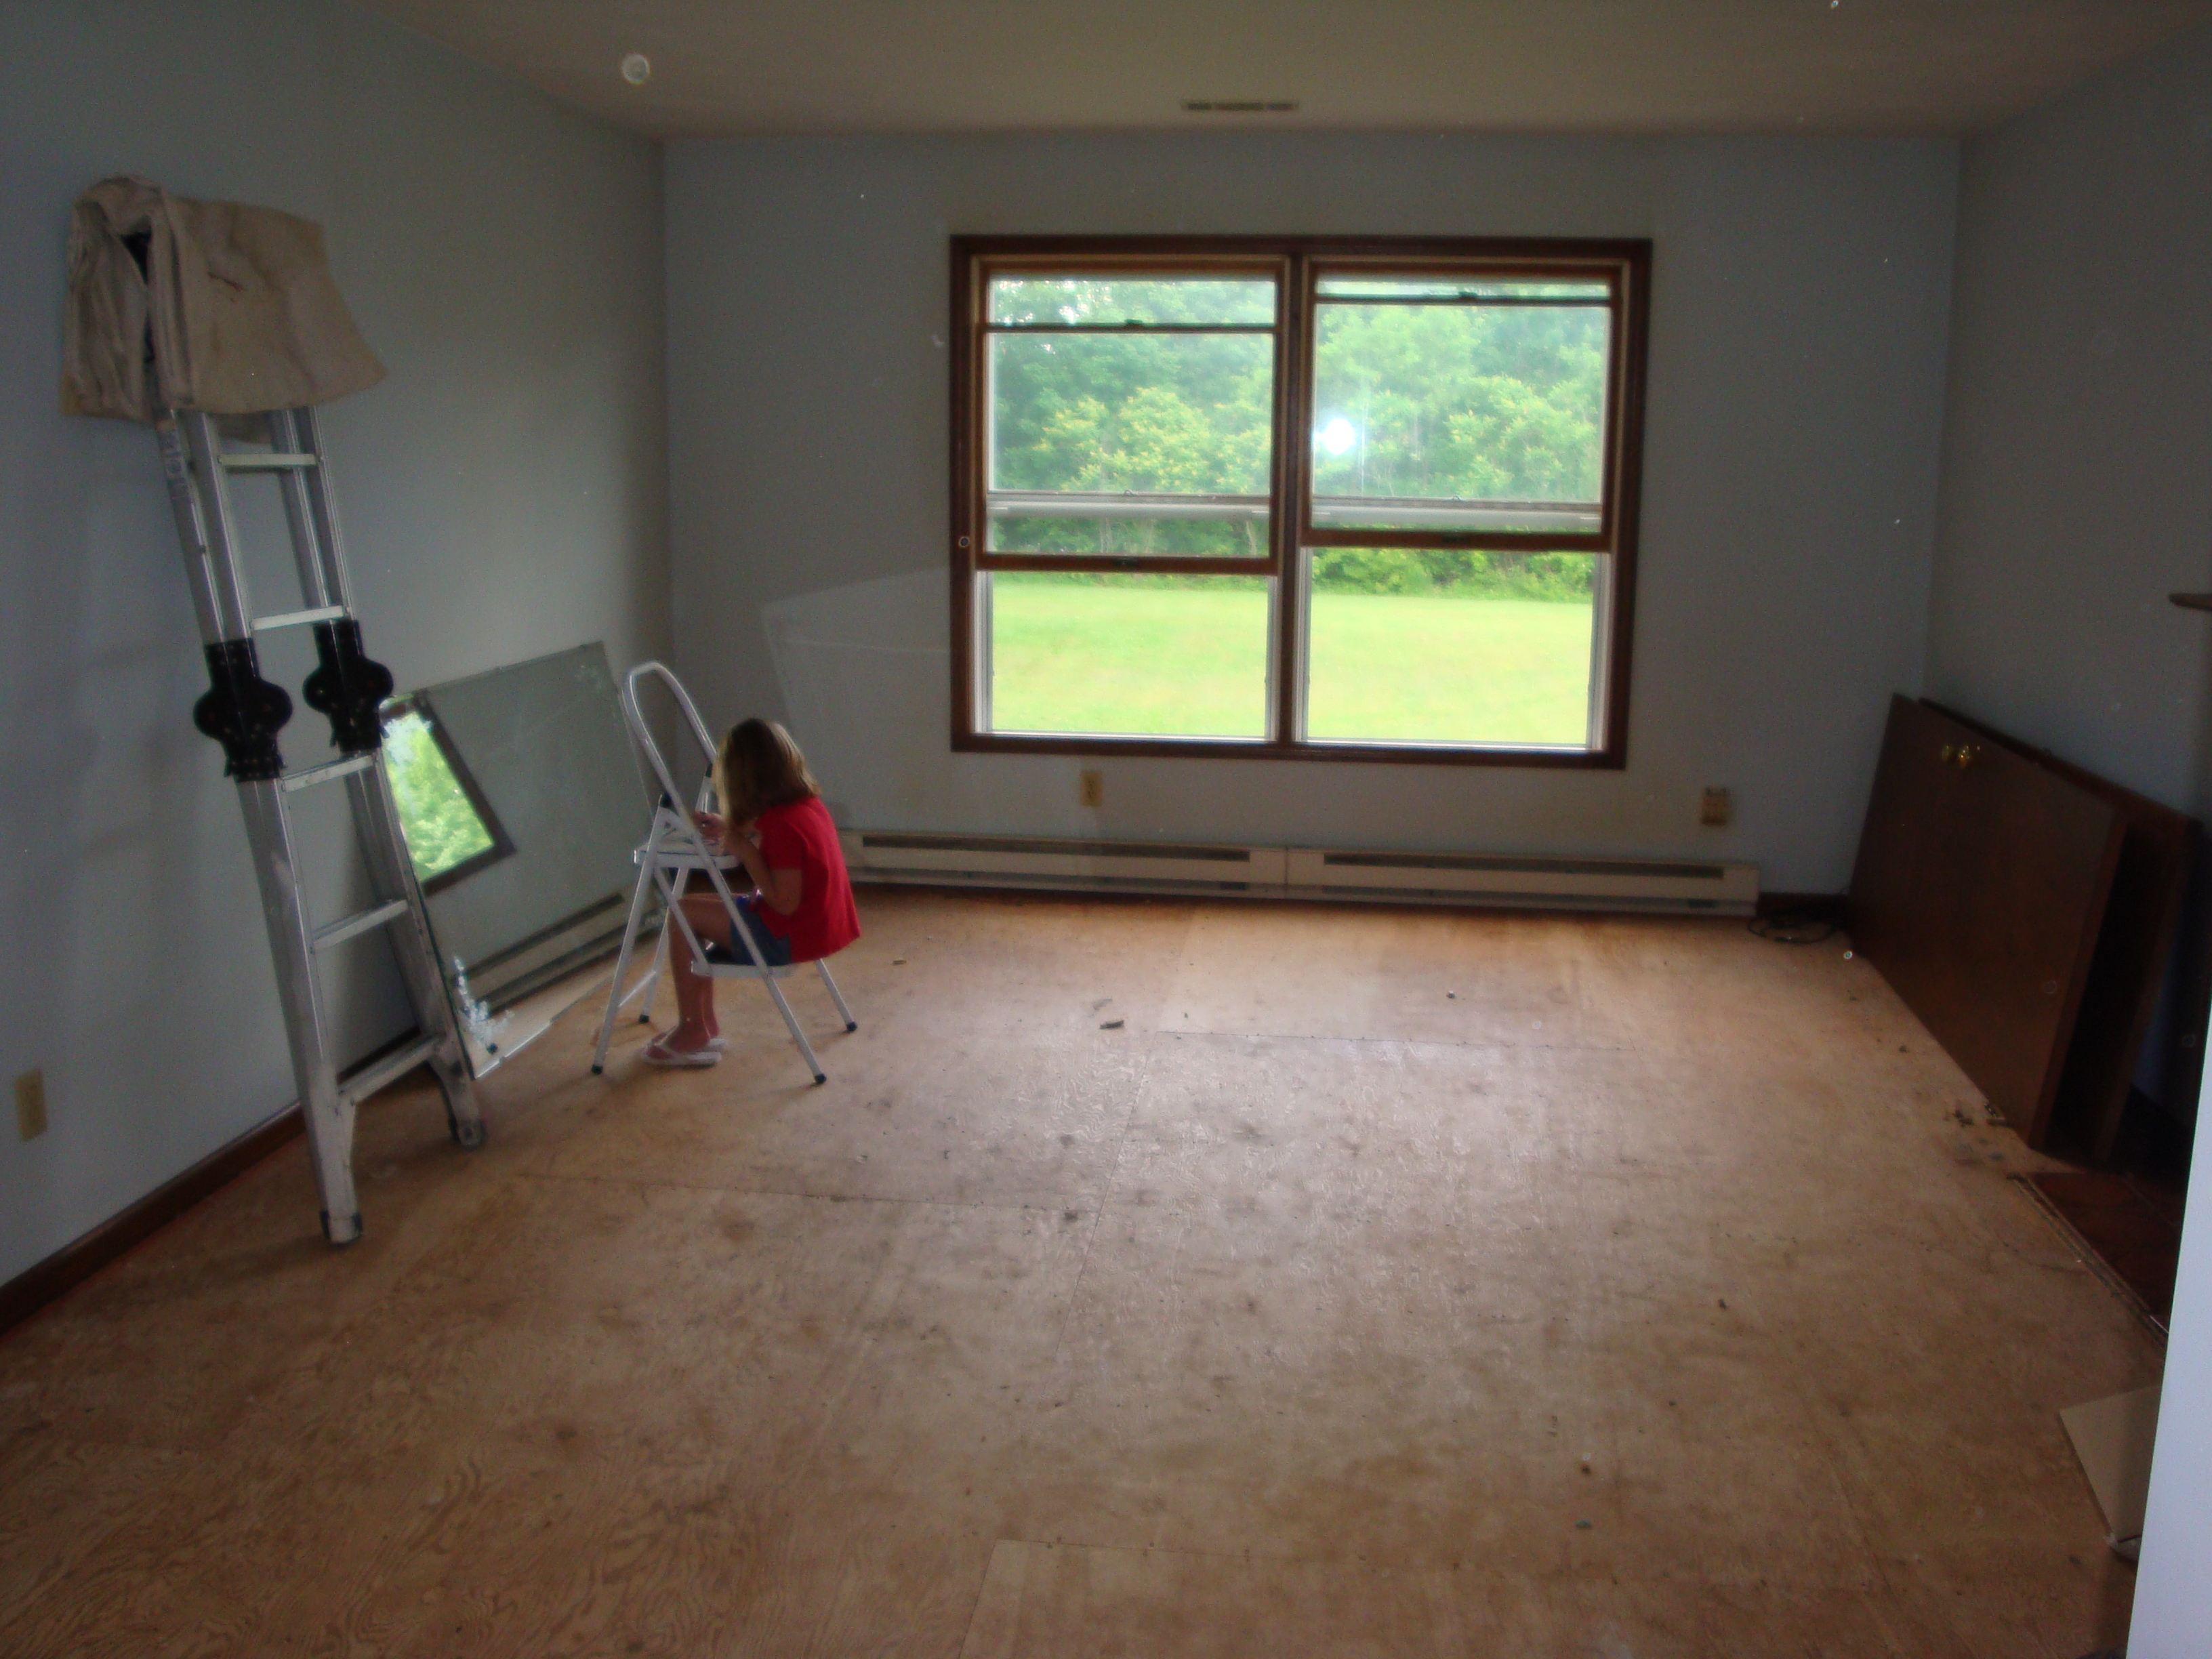 Home Renovations Update Living Room Progress